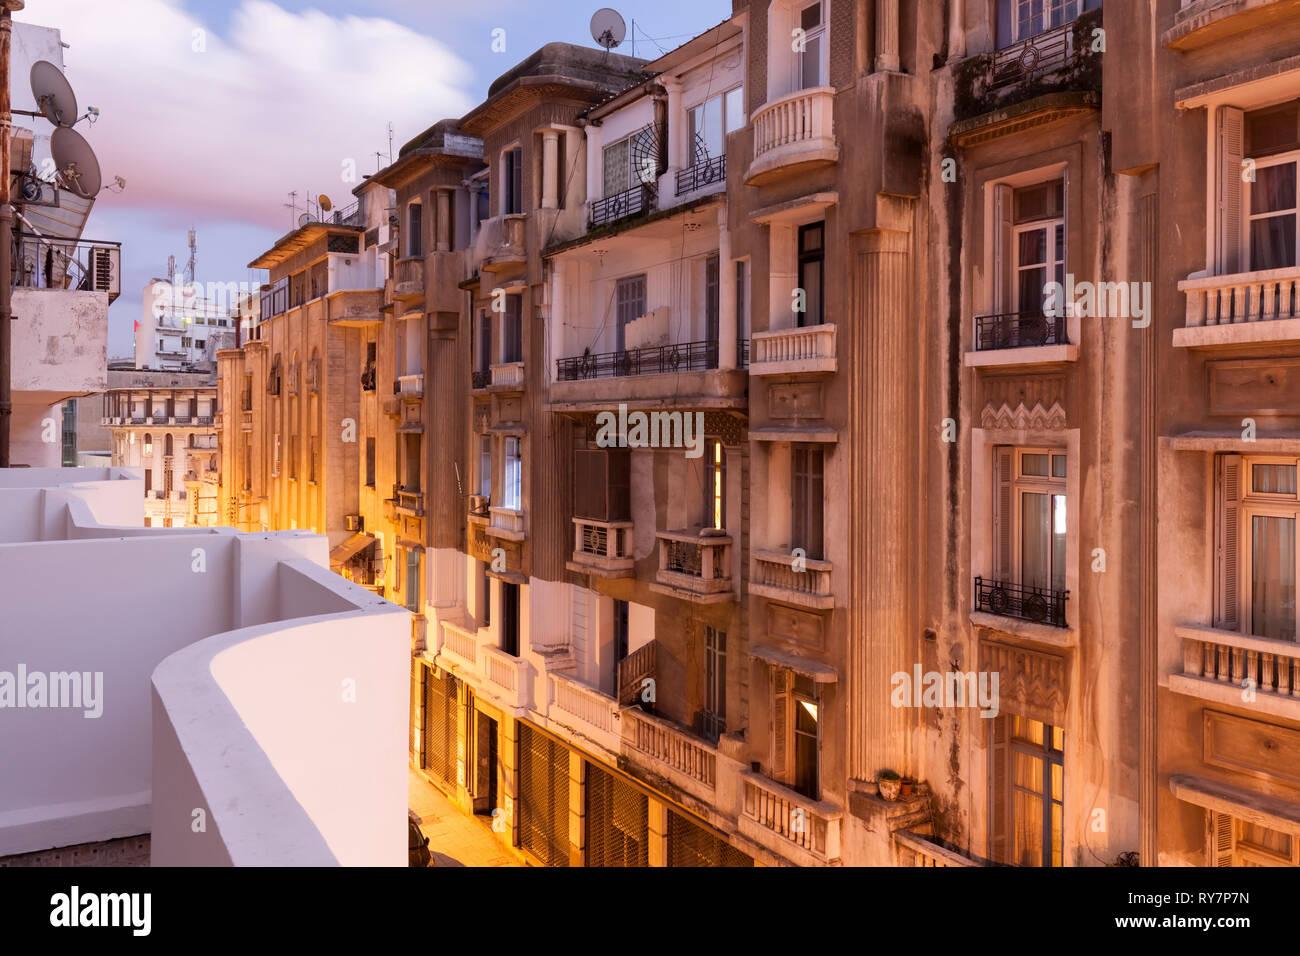 Edifici di appartamenti di notte lungo Rue Abou Soufiane. Casablanca, Casablanca-Settat, Marocco, Africa. Immagini Stock